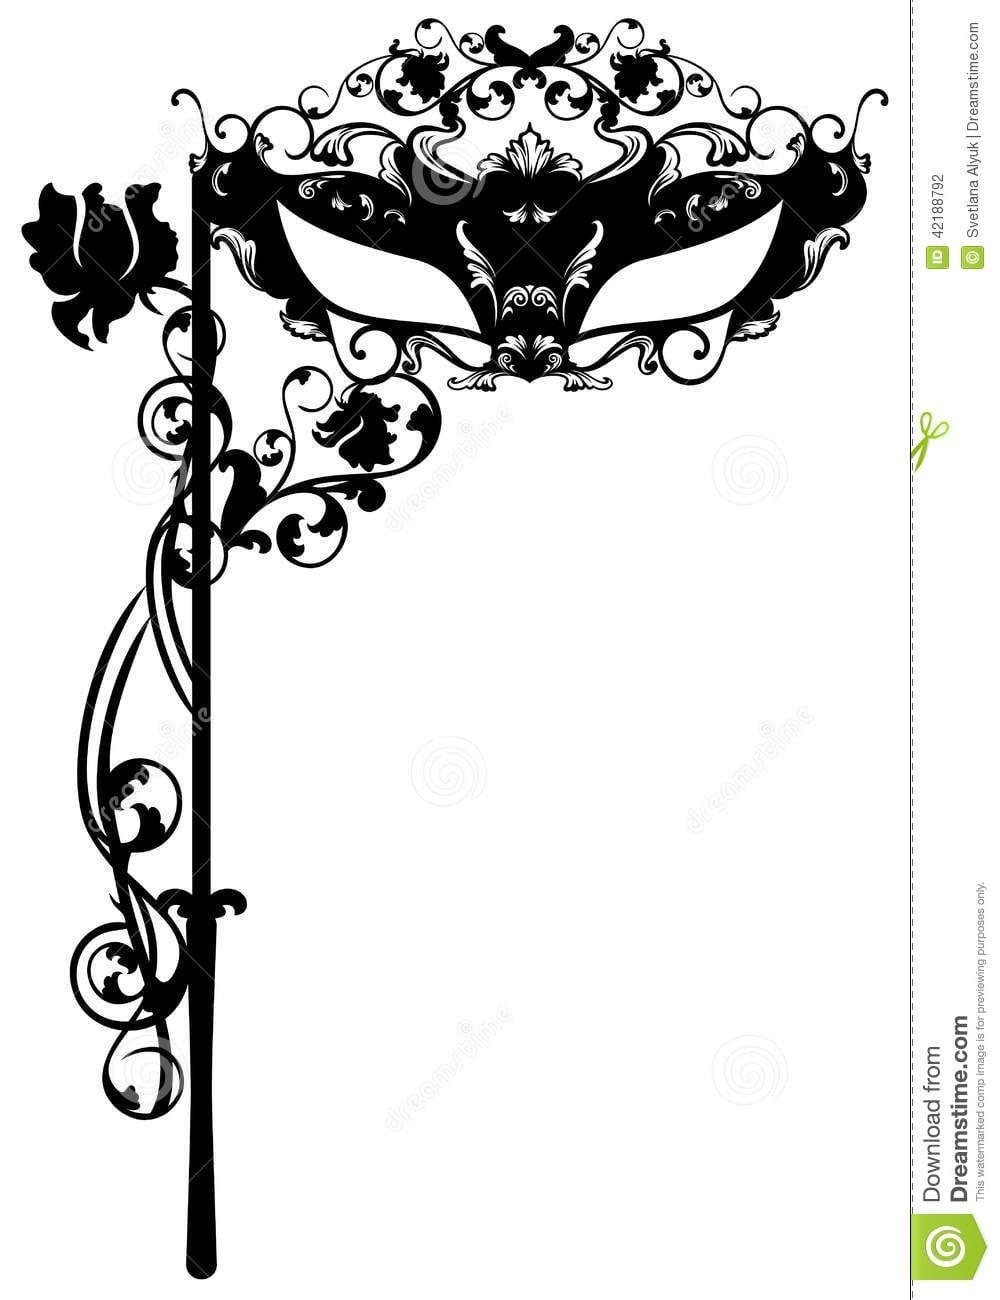 Blank Masquerade Invitations Masquerade Invitations Masquerade Party Invitations Party Invite Template